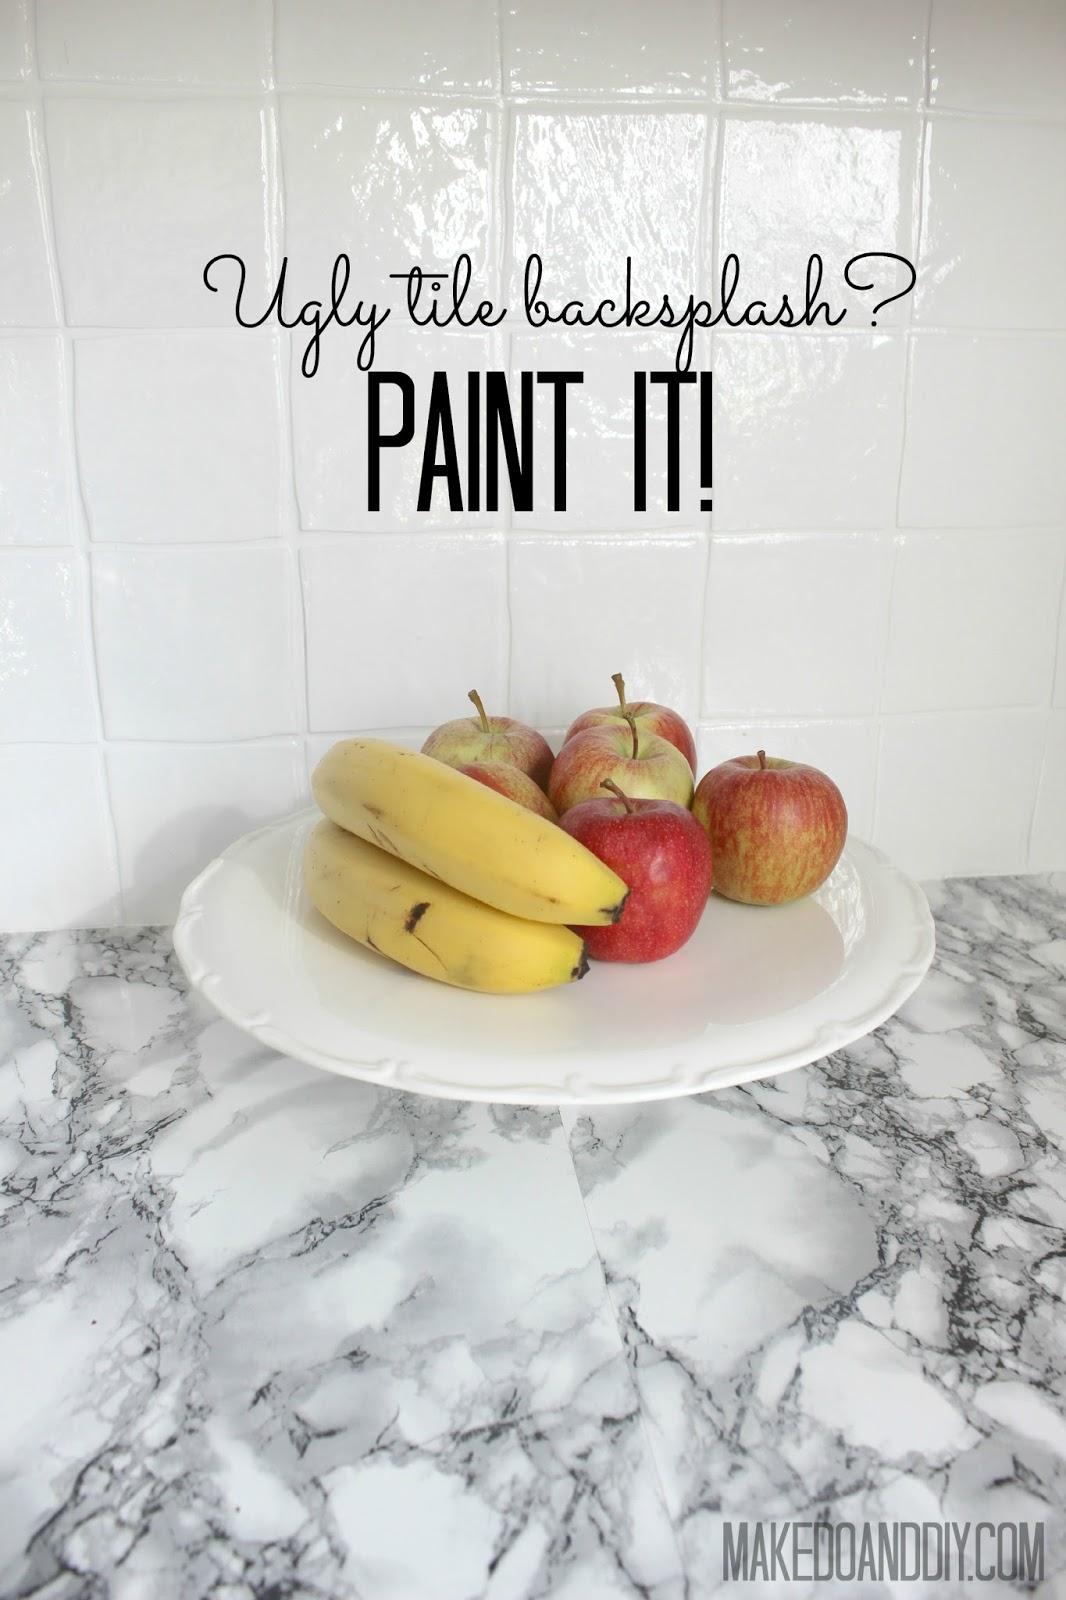 Painted Tile Backsplash Cover Those Ugly Tiles Make Do And Diy